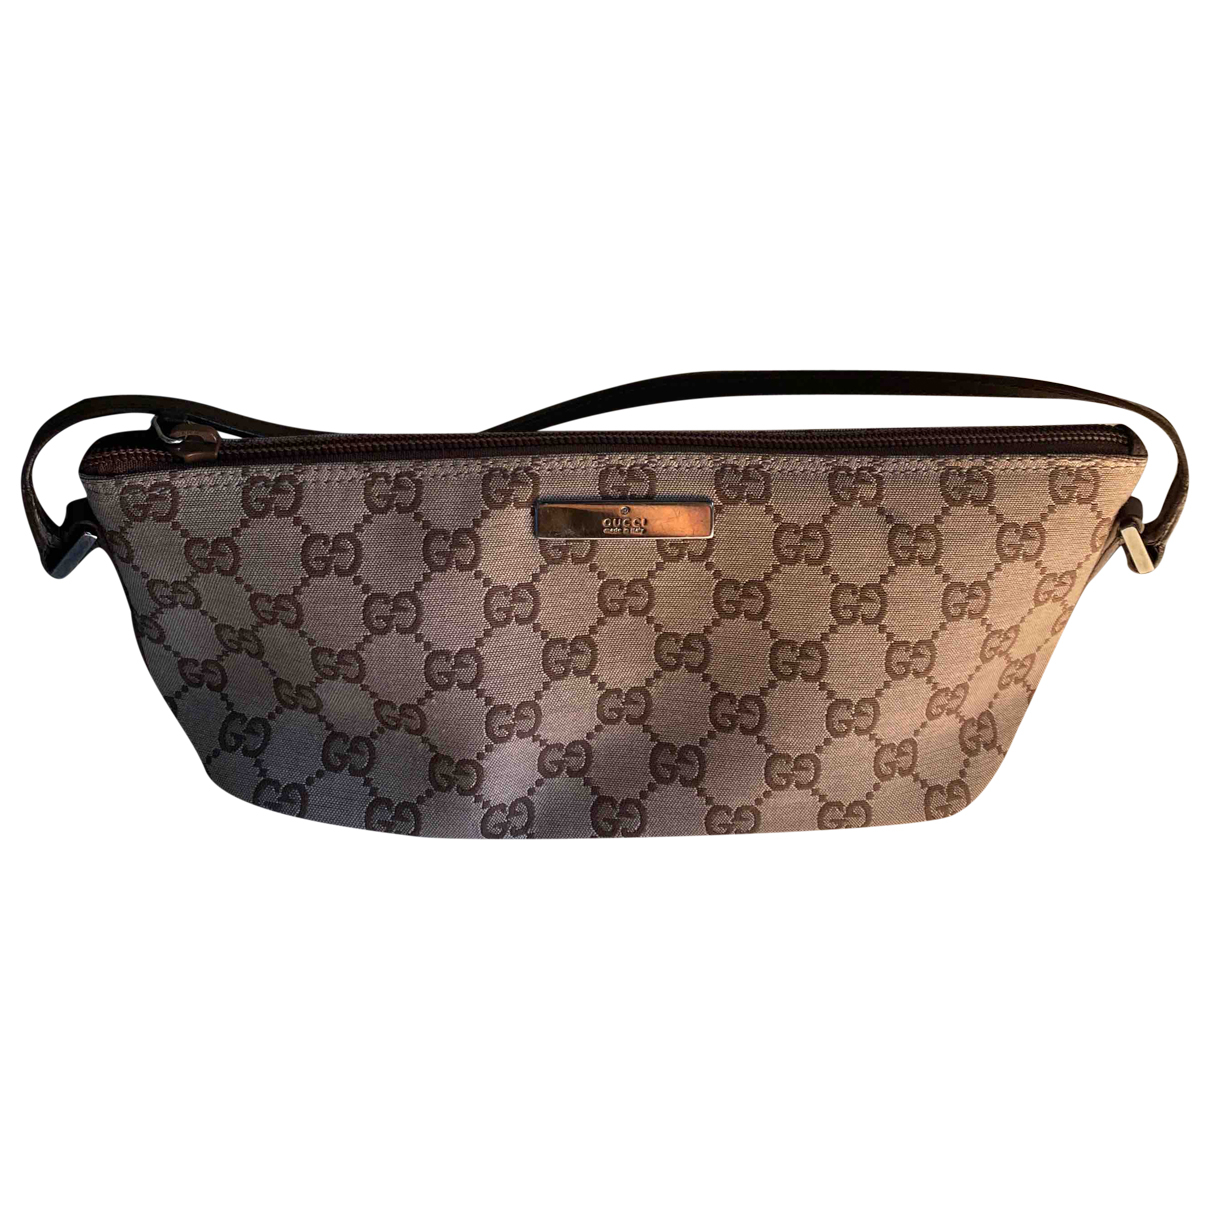 Bolso baguette de Lona Gucci